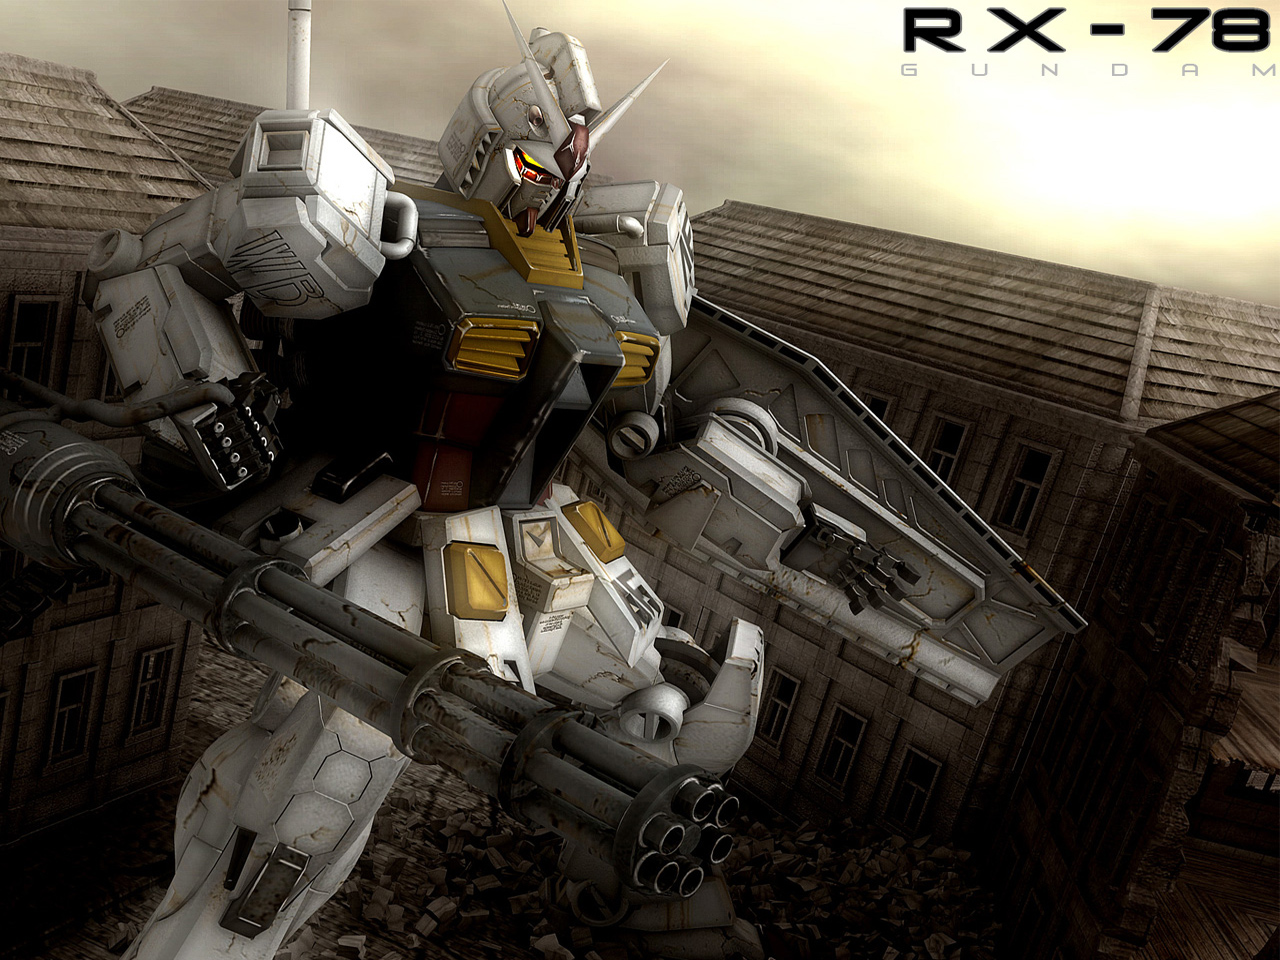 Gundam RX 78 Gundam Wallpaper 1280x960